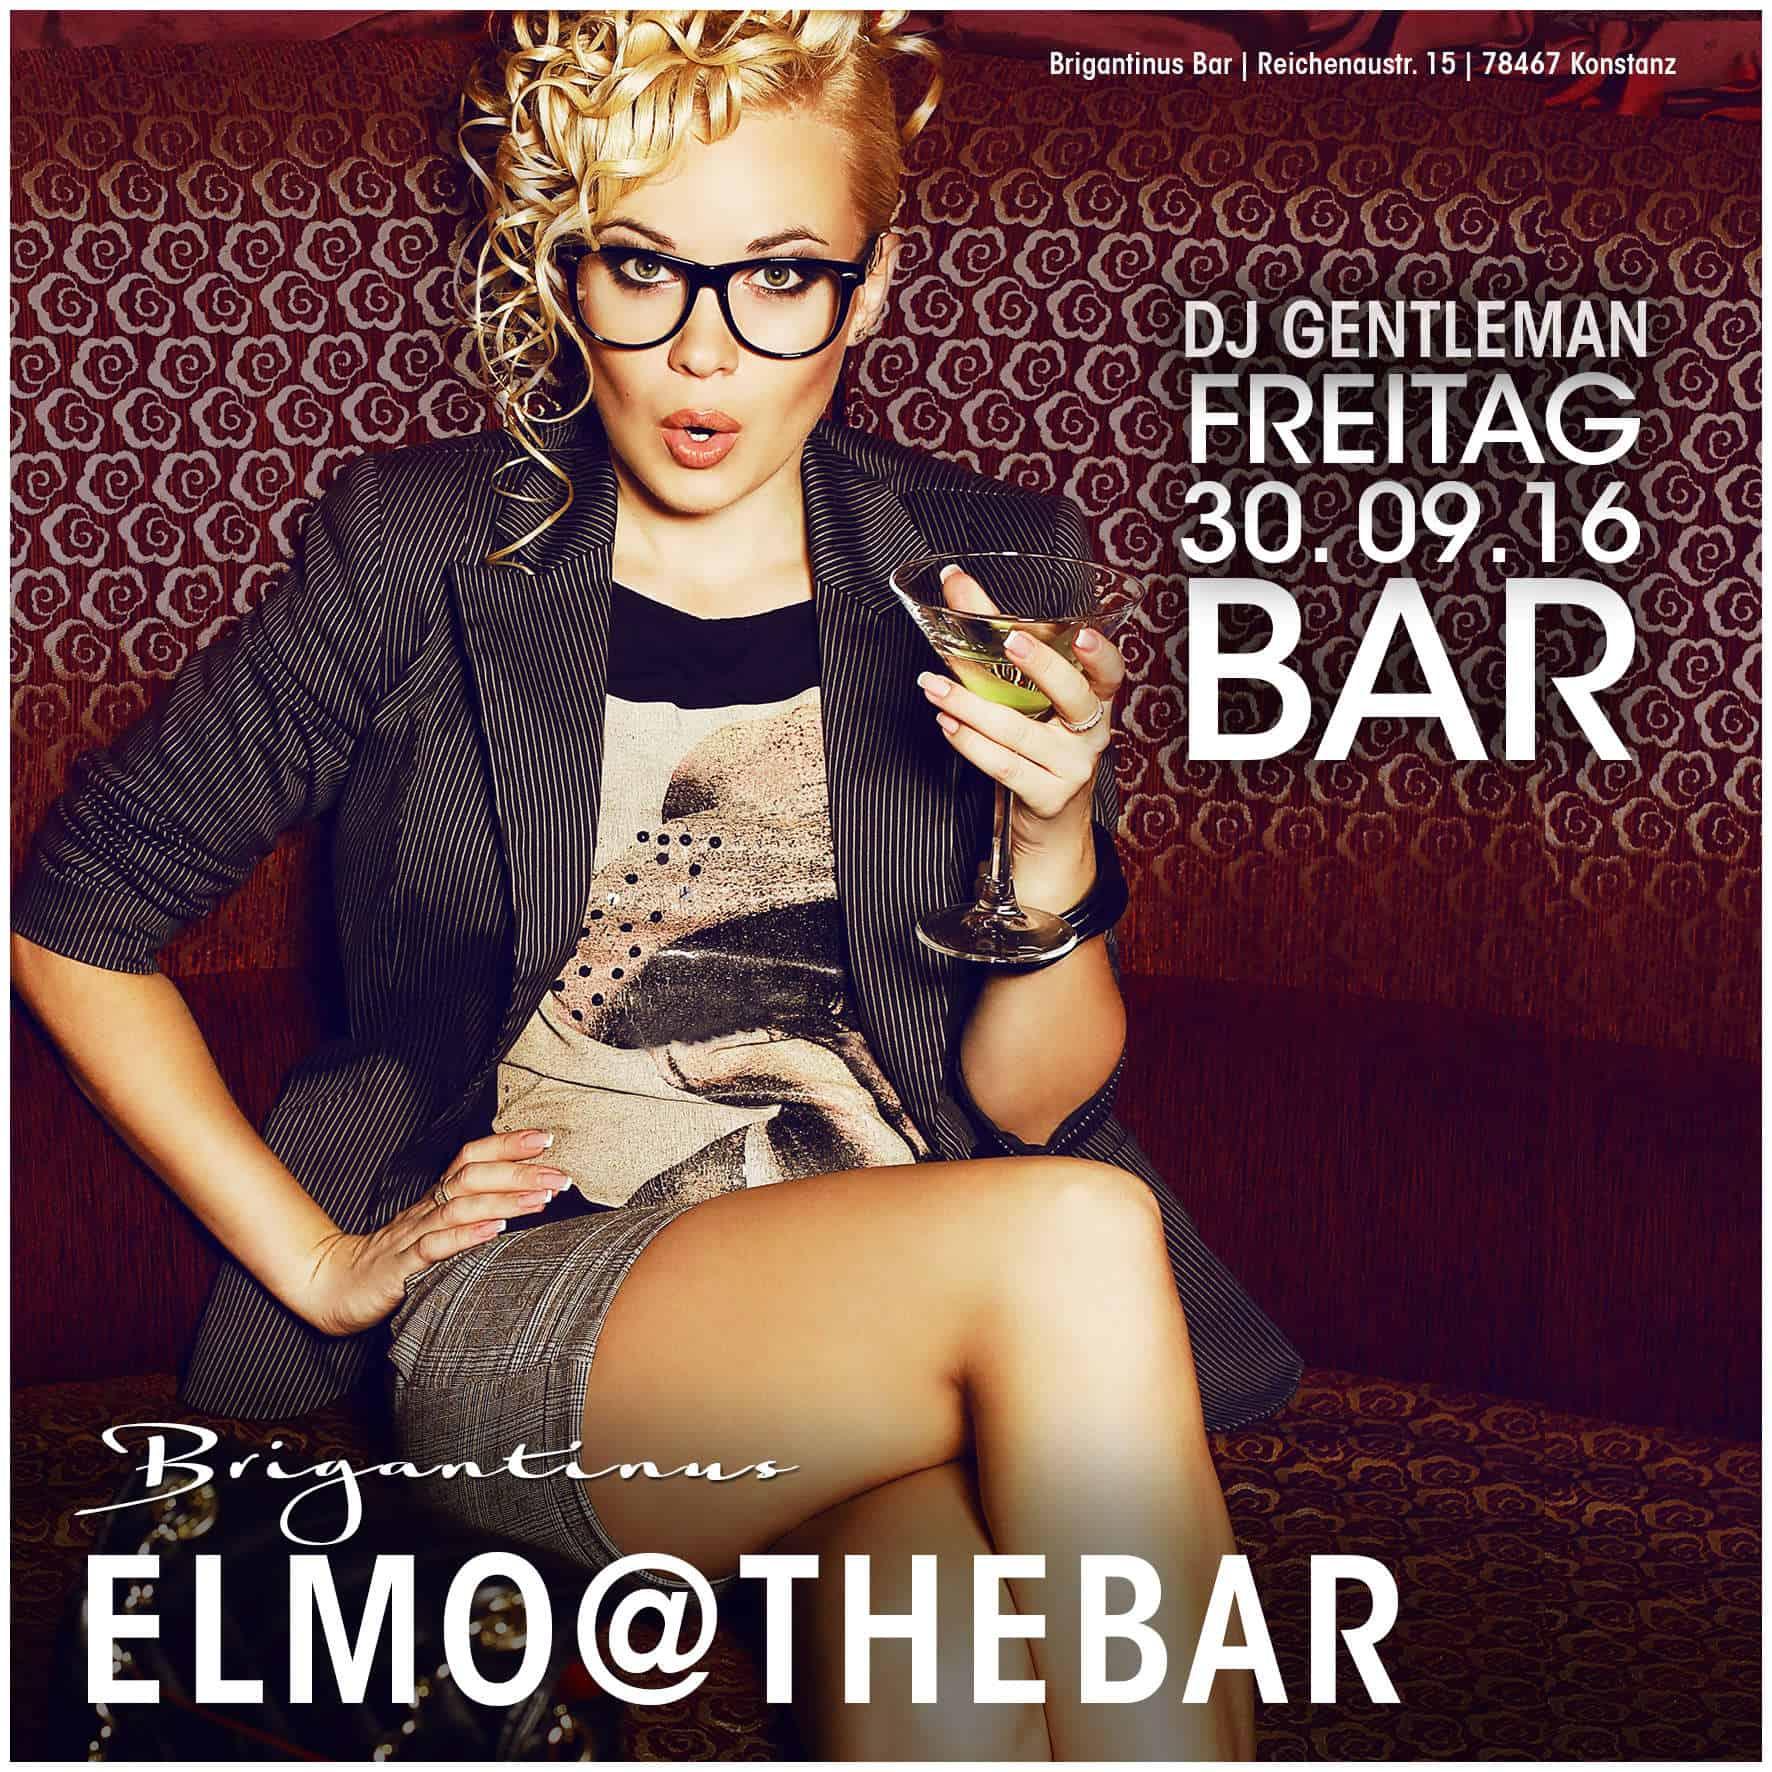 Elmo-bar-30-9-16